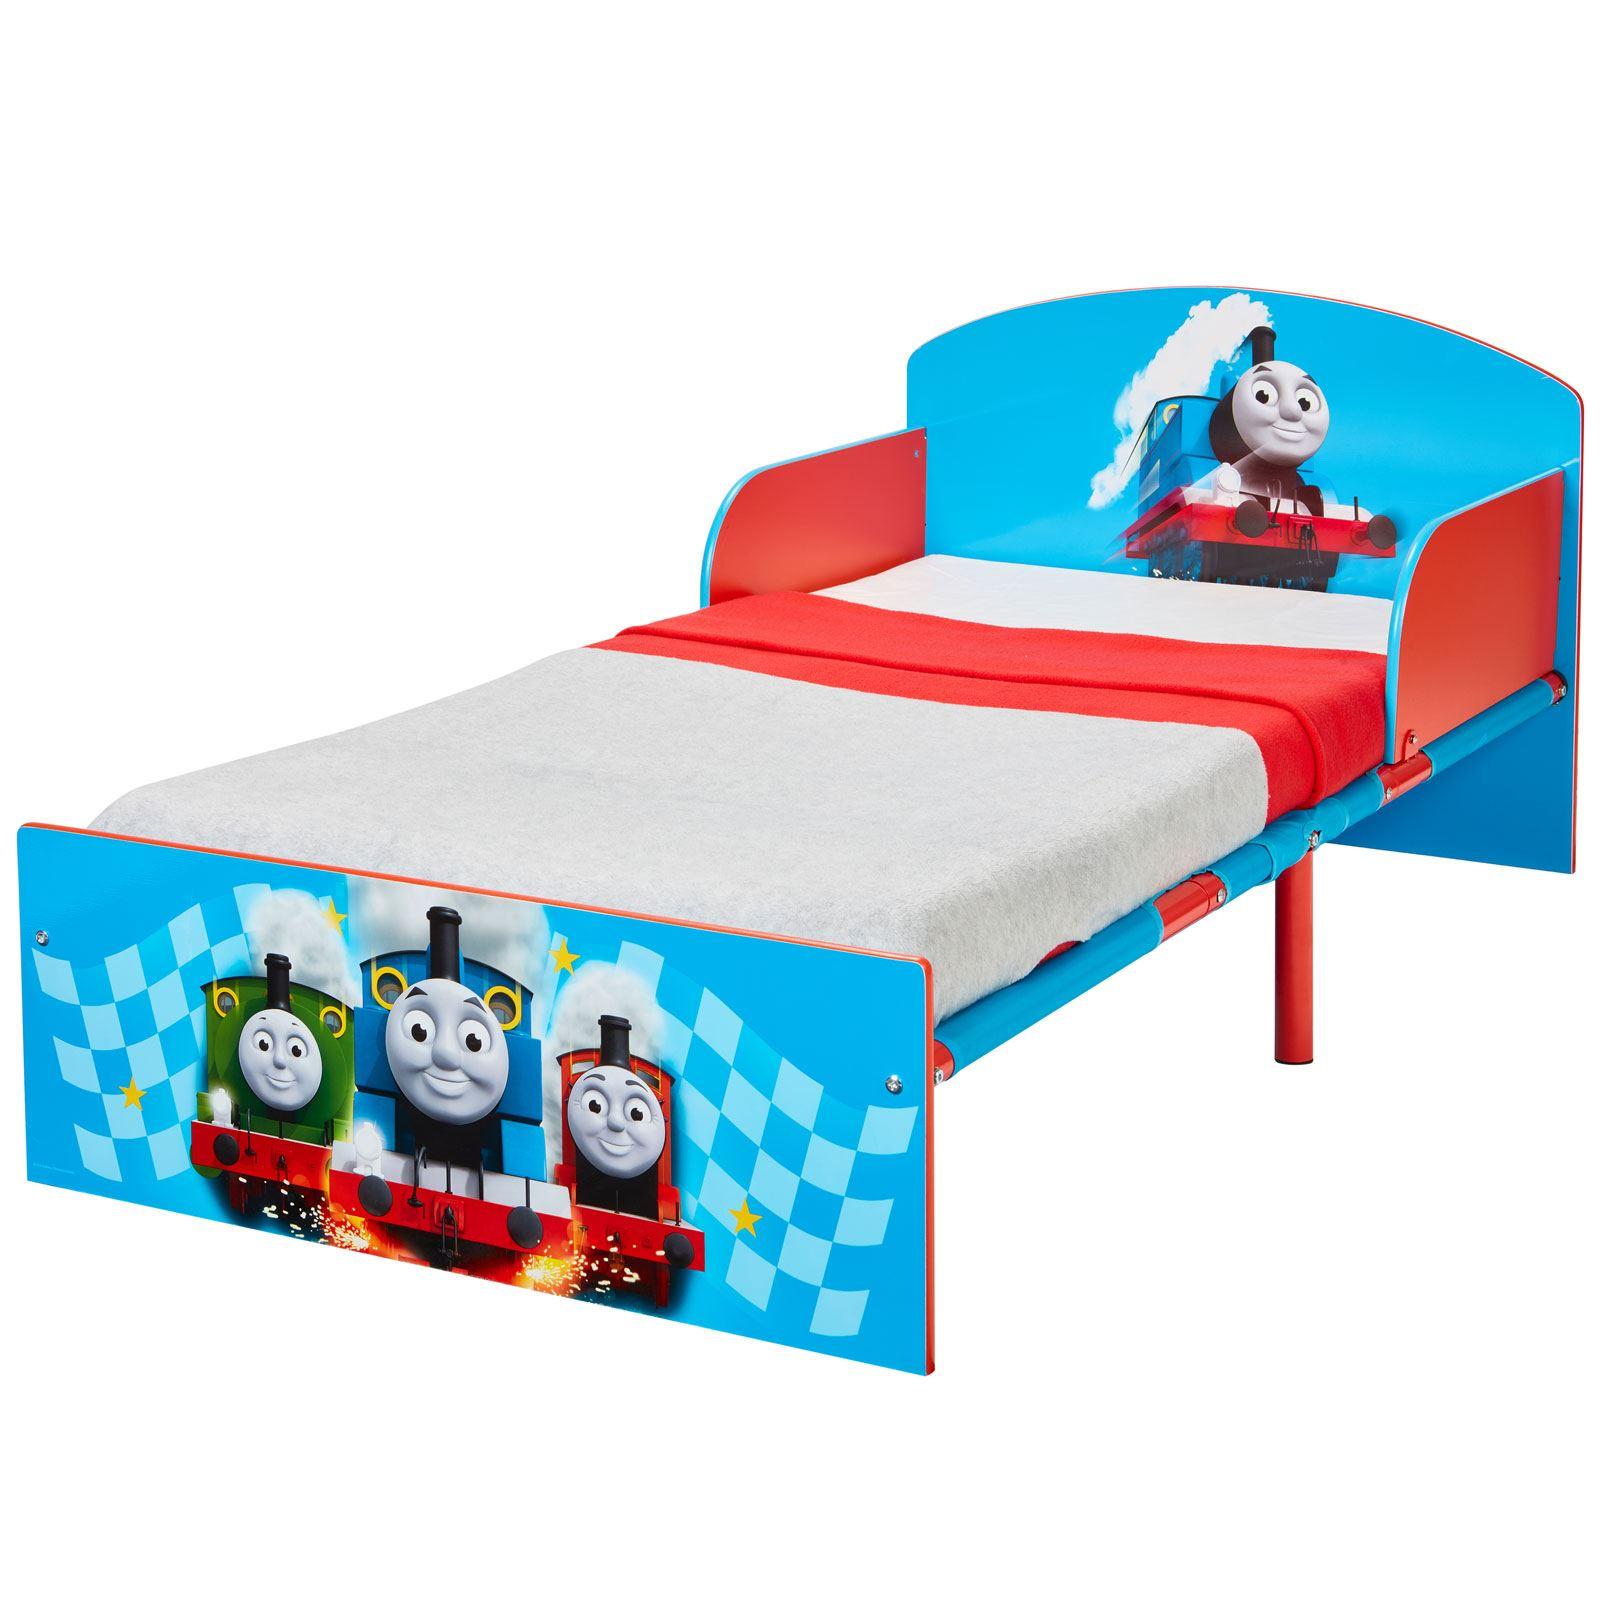 miniatura 49 - KIDS CHARACTER TODDLER BEDS - BOYS GIRLS BEDROOM DISNEY